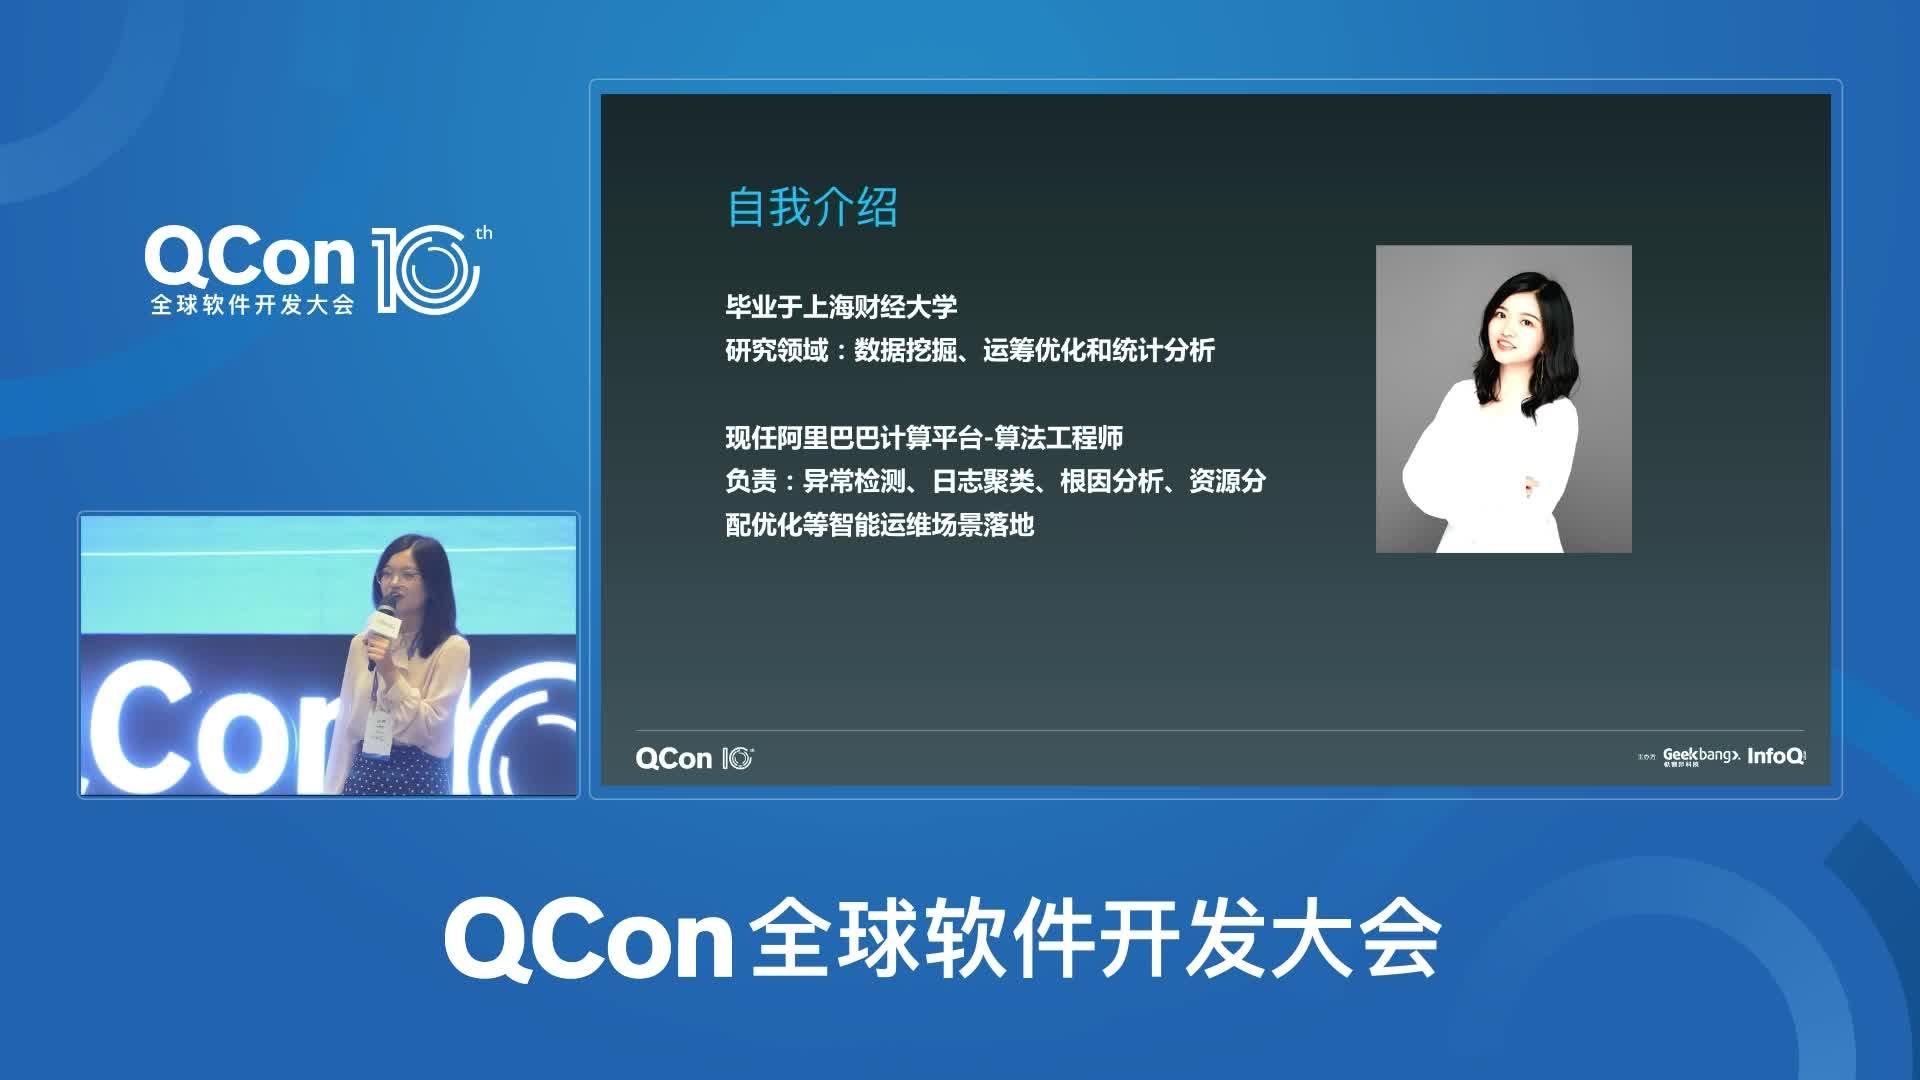 DataOps - 数据驱动的智能运维丨QCon